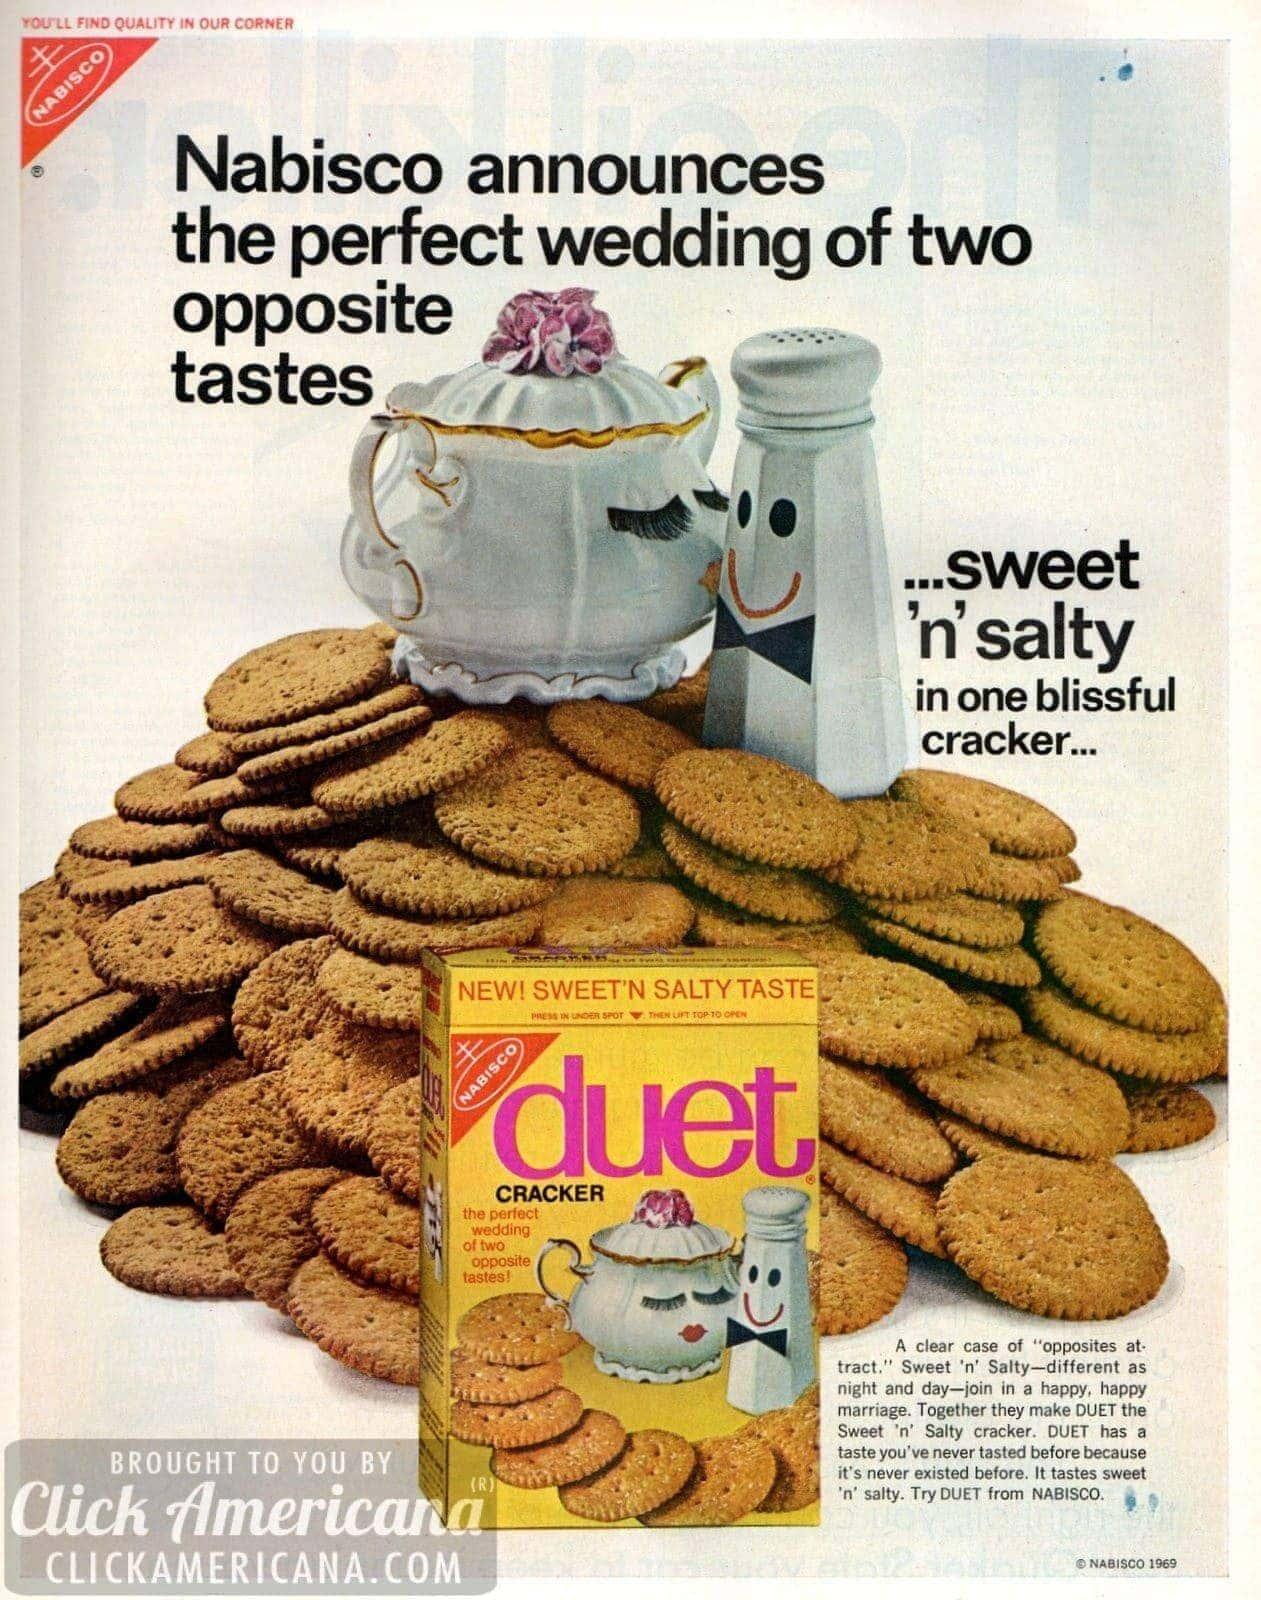 Opposites attract: Sweet 'n Salty Duet crackers (1969)